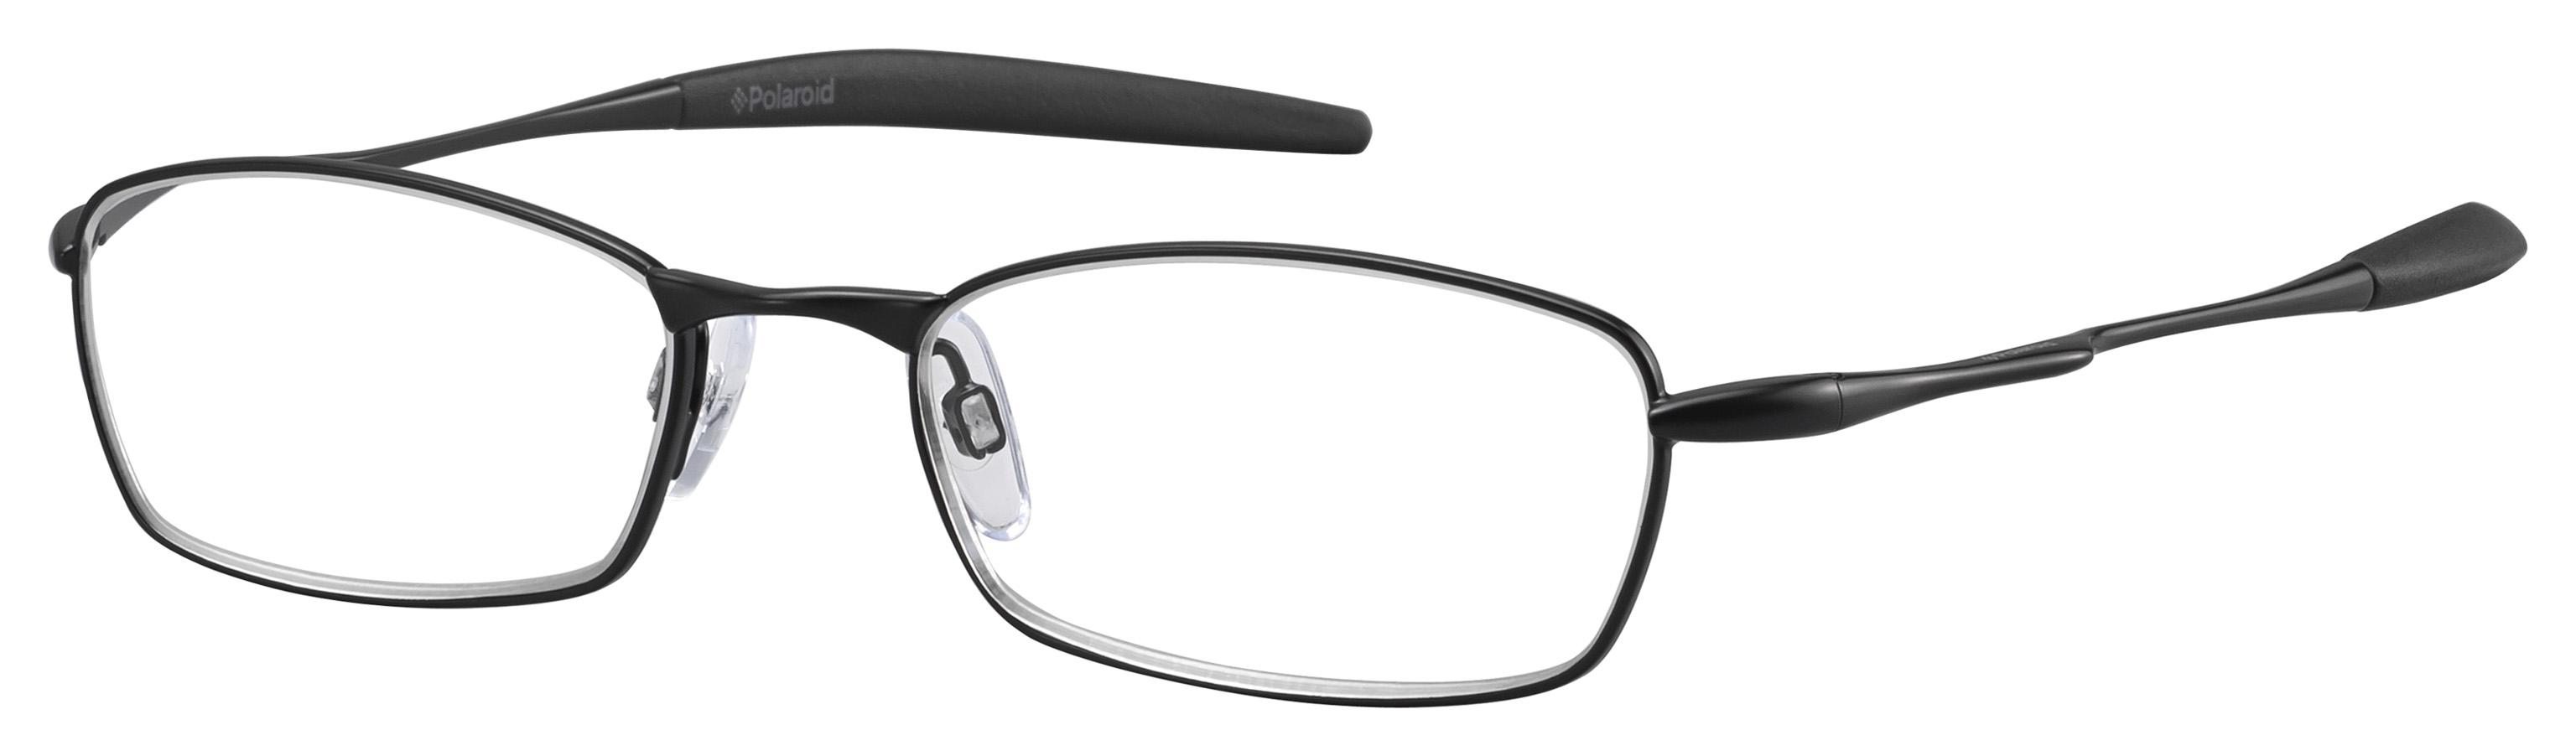 Leesbril Polaroid S3406 zwart